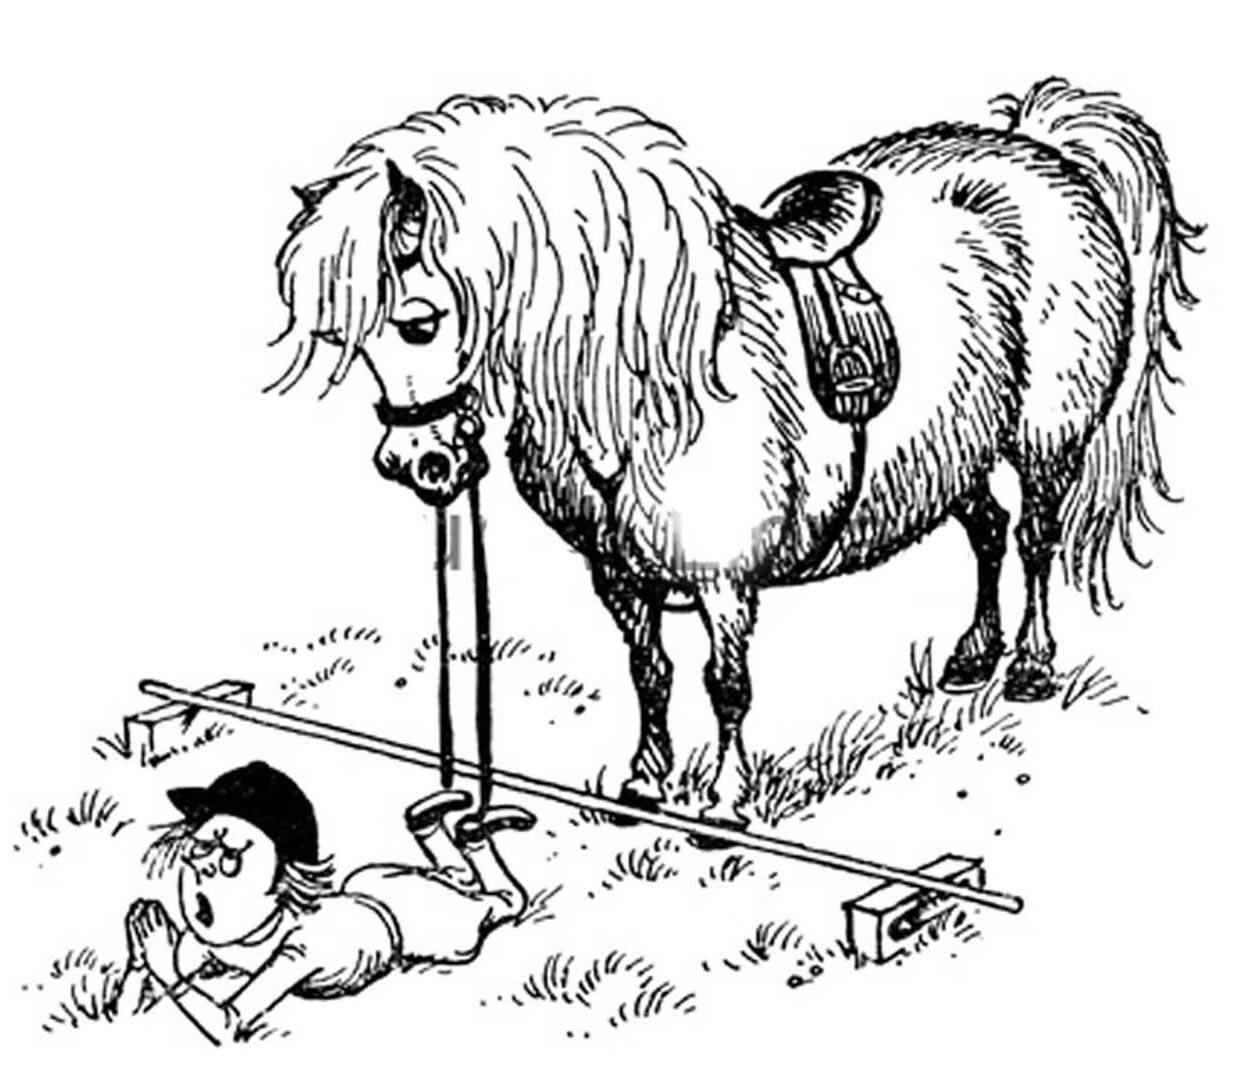 Falling Off a Horse